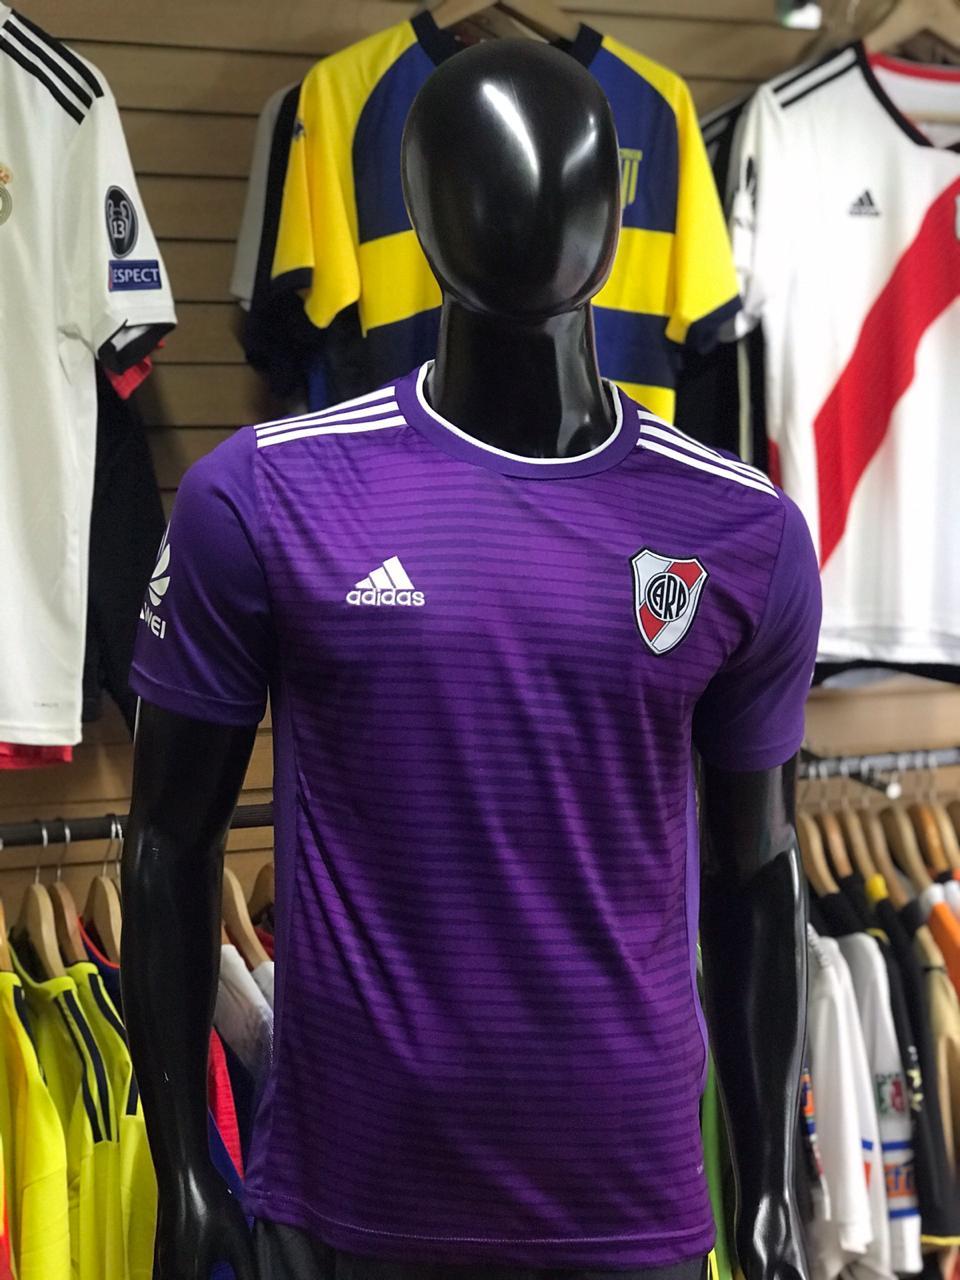 b00772cc2b9a9 Camiseta River Plate Alternativa 2018-2019 - Fútbol de Primera